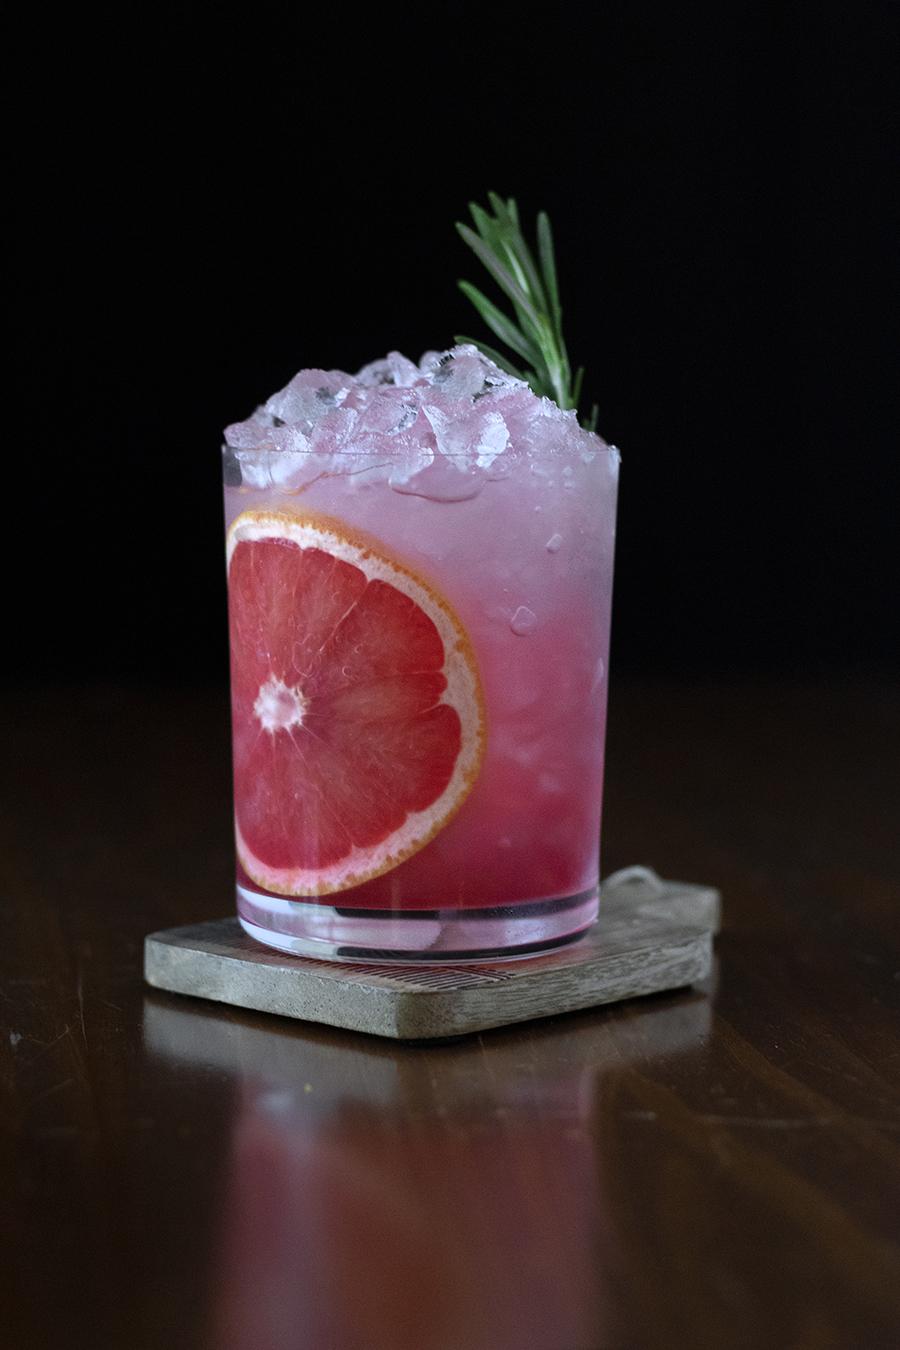 grapefruit and pomegranate vodka sour